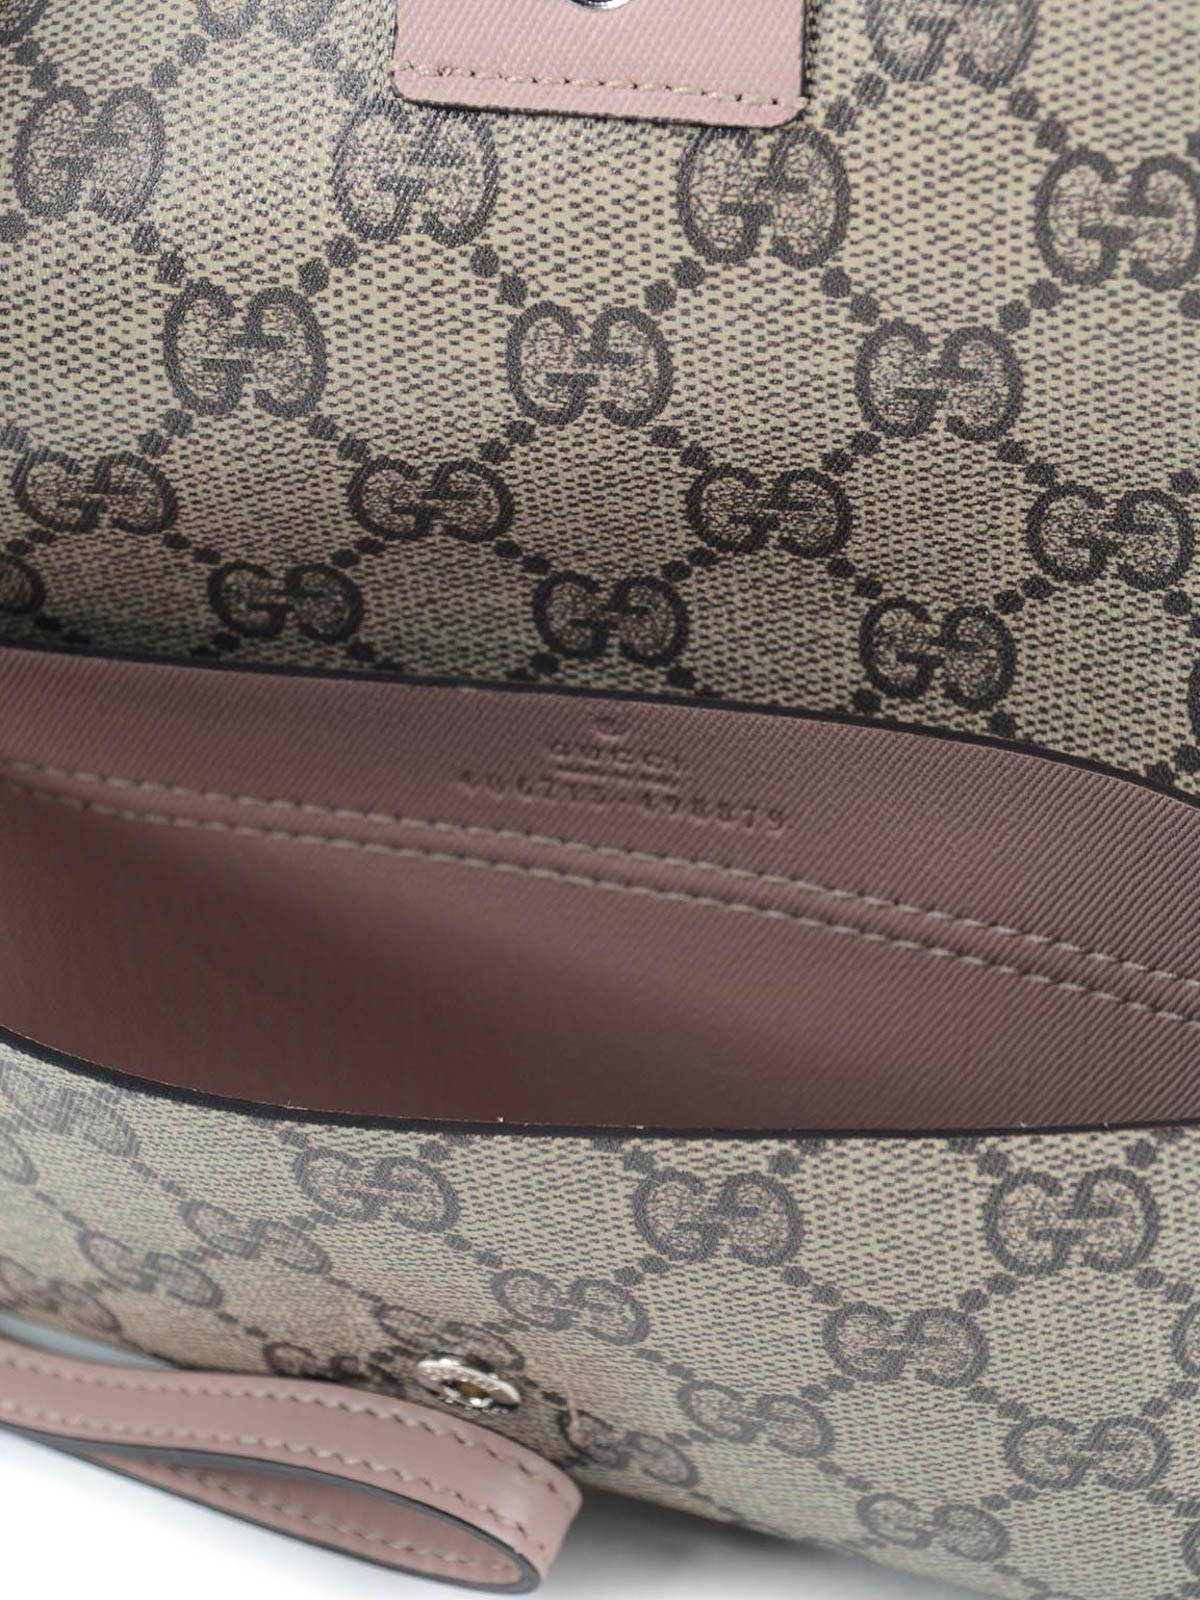 1c2fa61babe797 Gucci - Wristlet pouch - wallets & purses - 406715 A981N 8412 ...